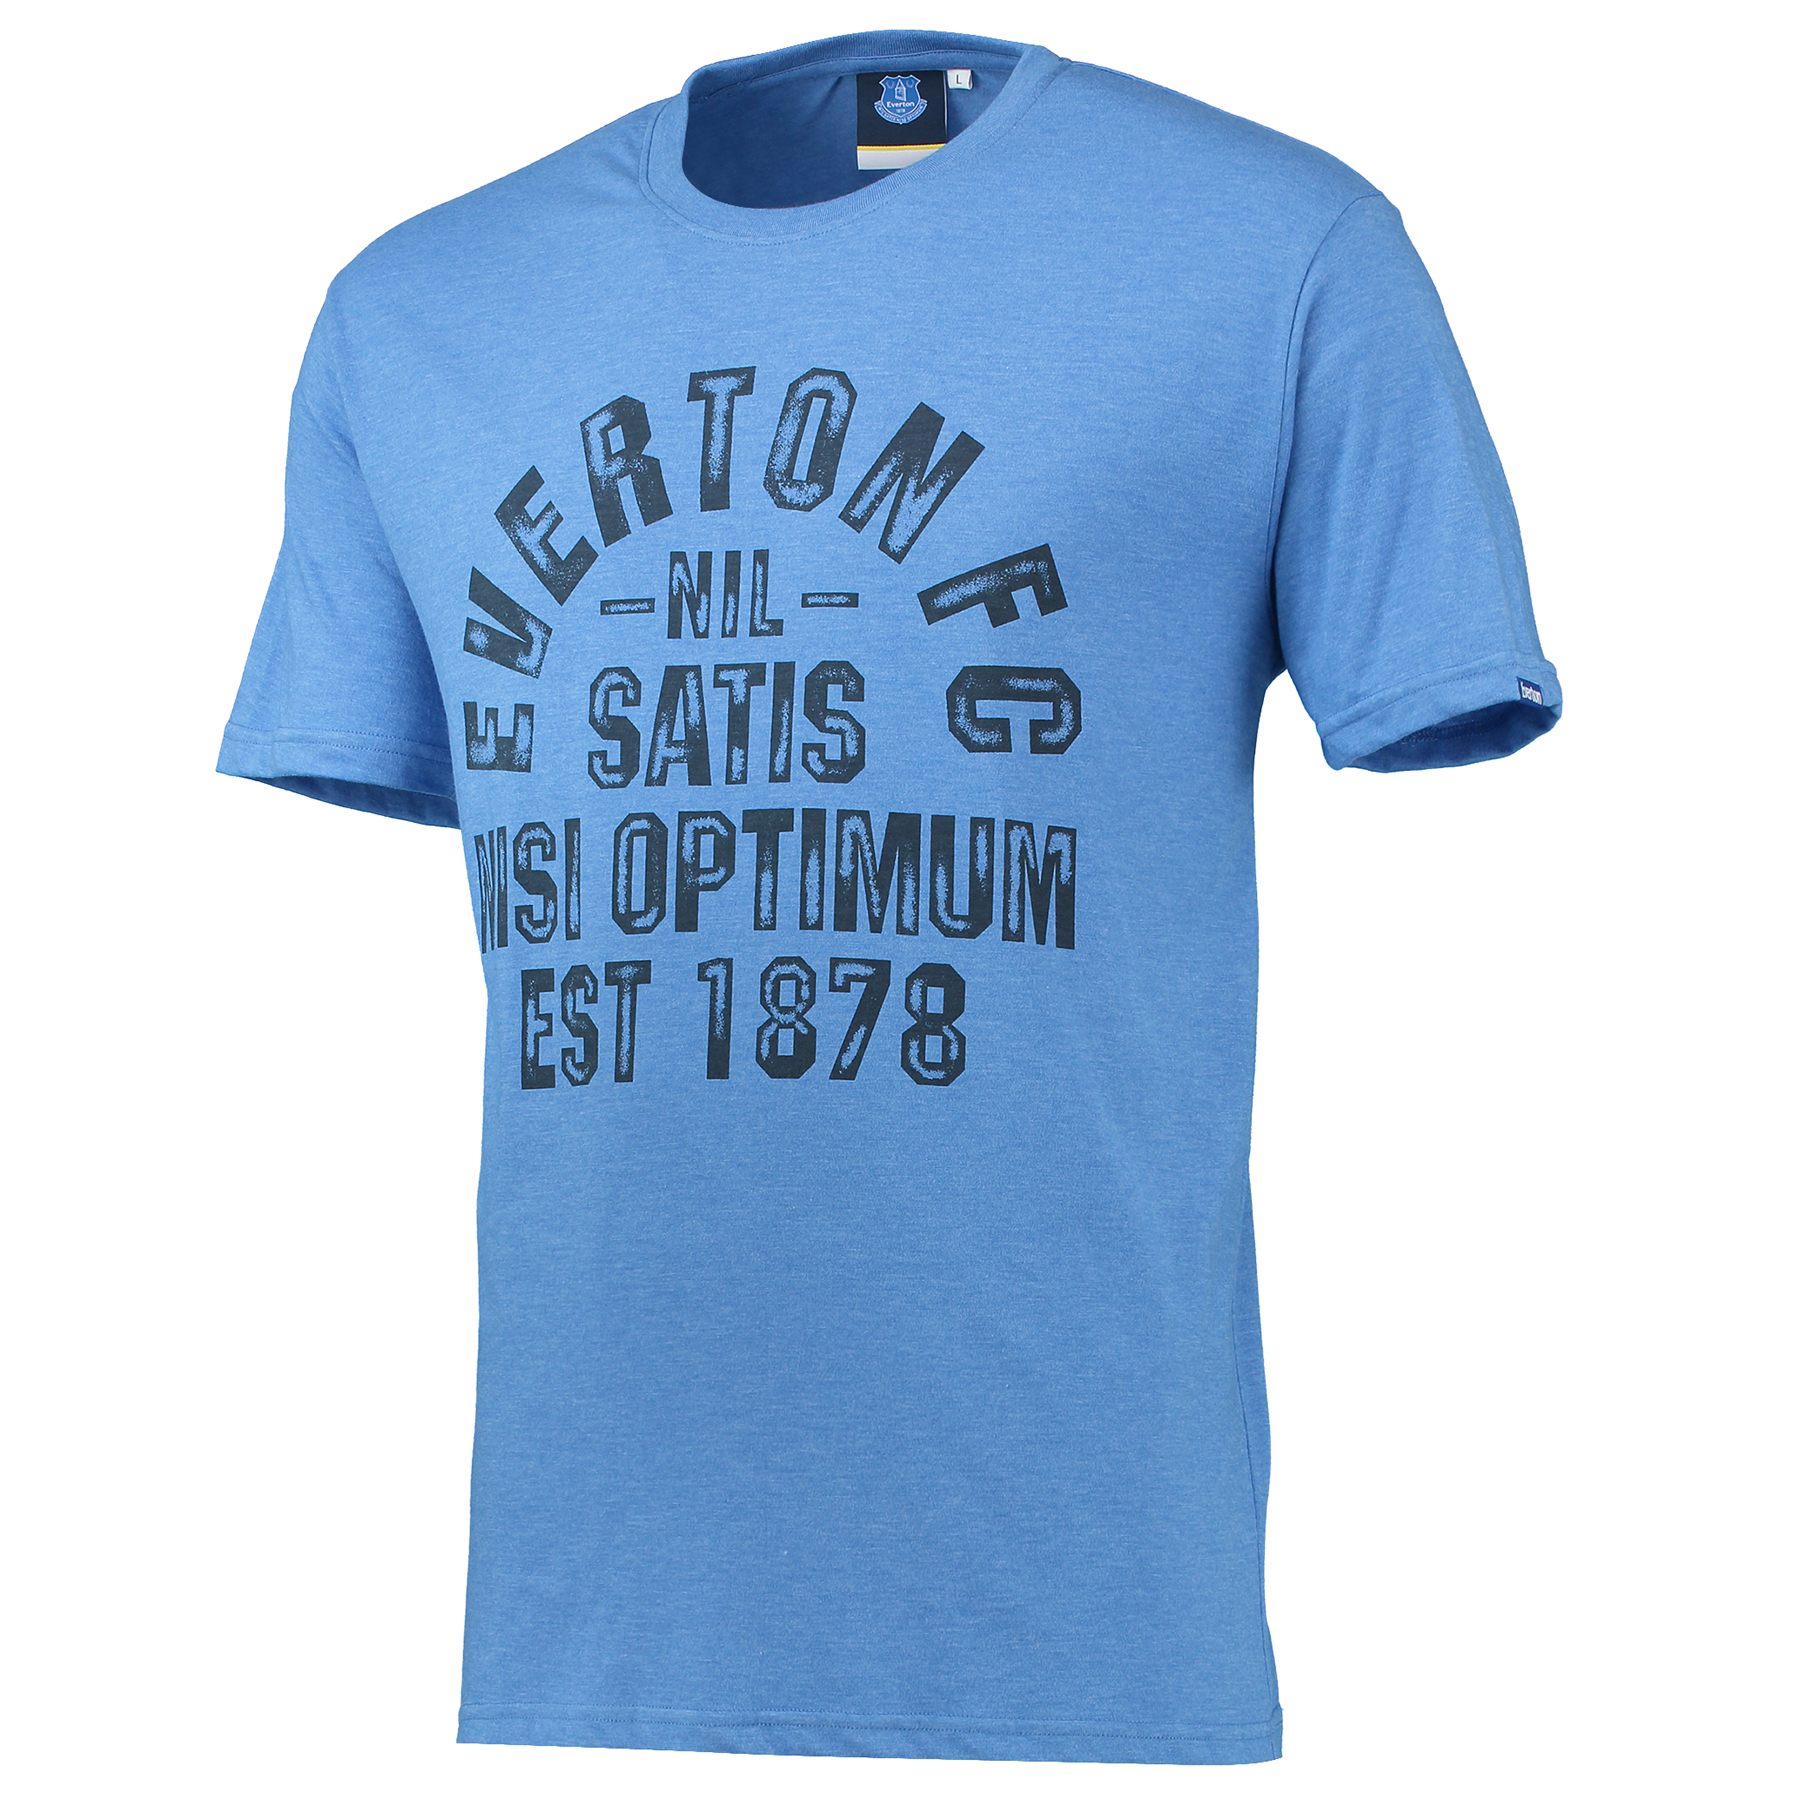 Everton Optimum T-Shirt - Royal